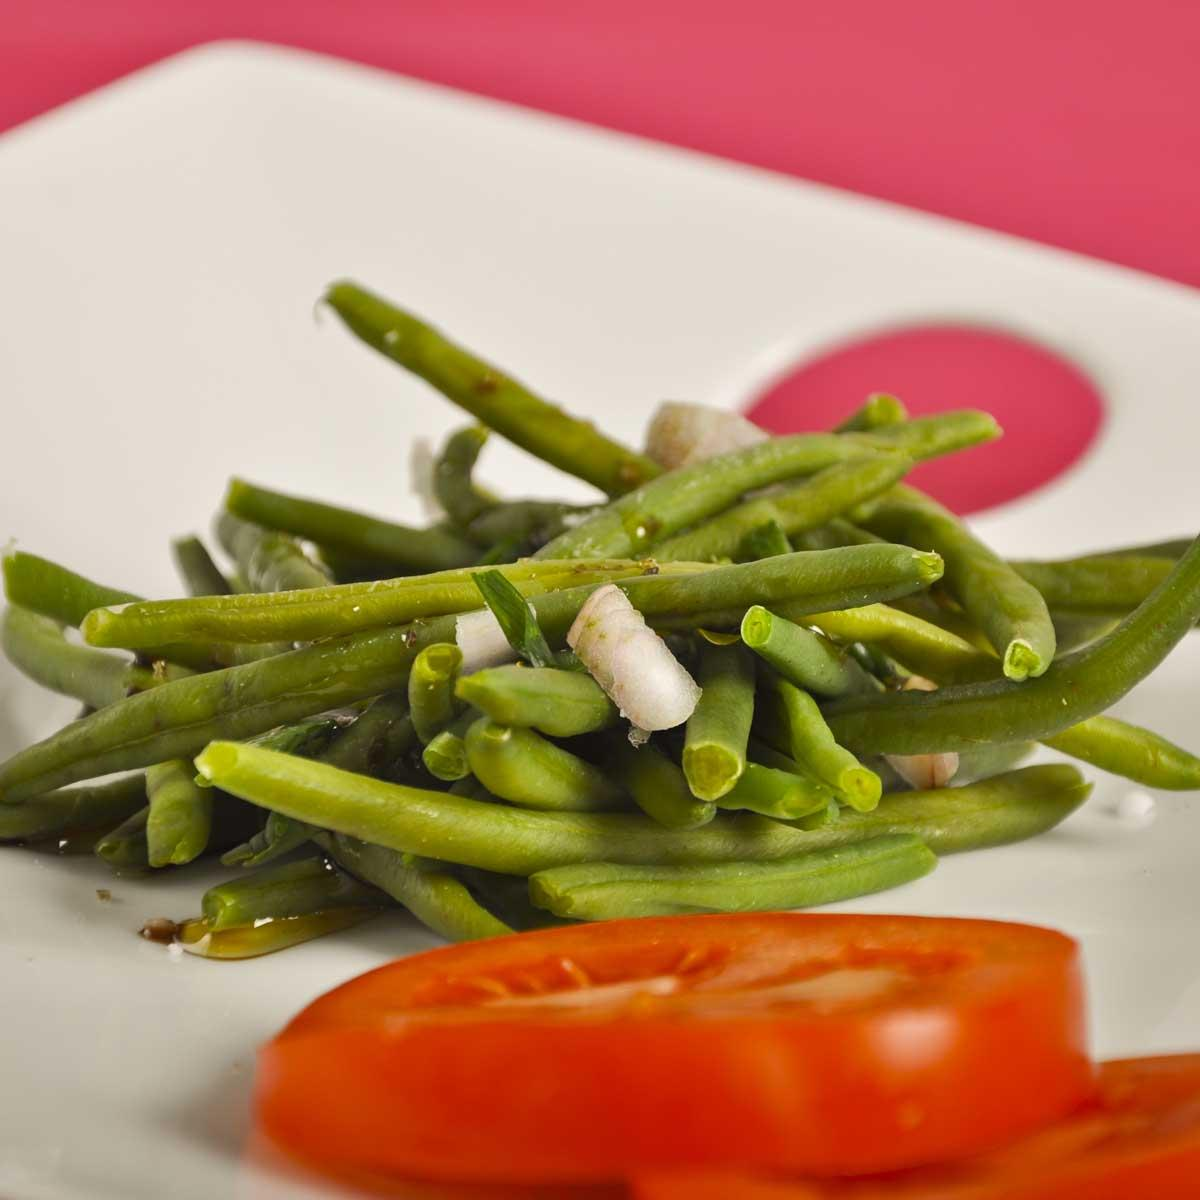 recette salade de haricots verts cuisine madame figaro. Black Bedroom Furniture Sets. Home Design Ideas